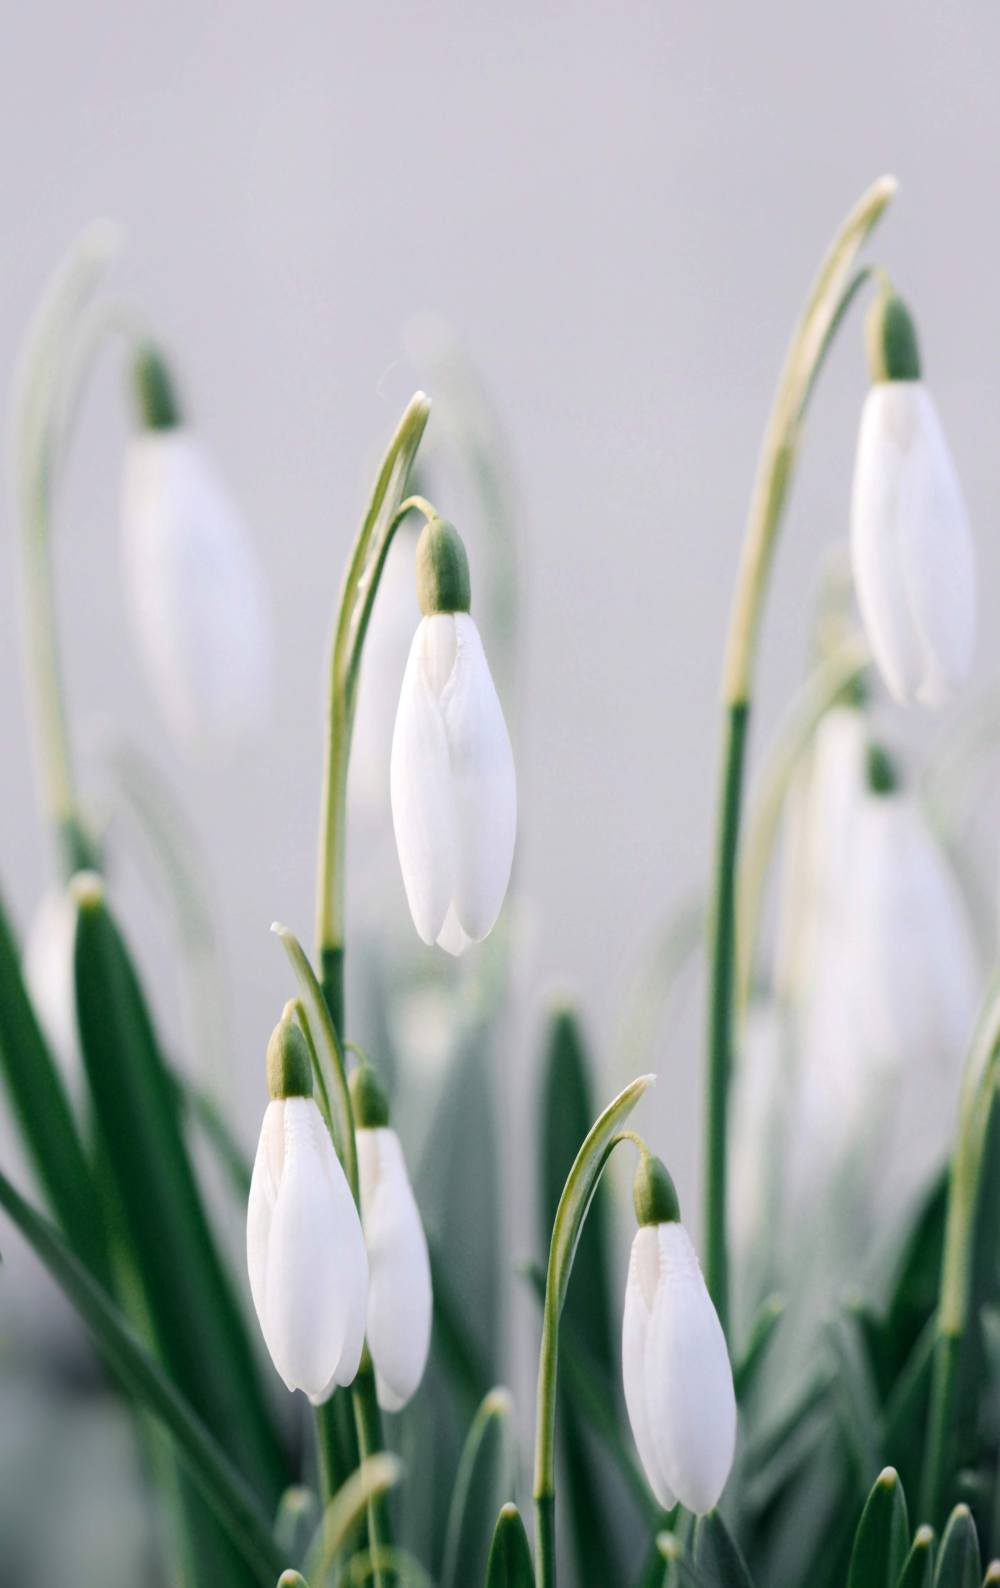 Snowdrop Flower Images : snowdrop, flower, images, Snowdrop, Pictures, Download, Images, Unsplash